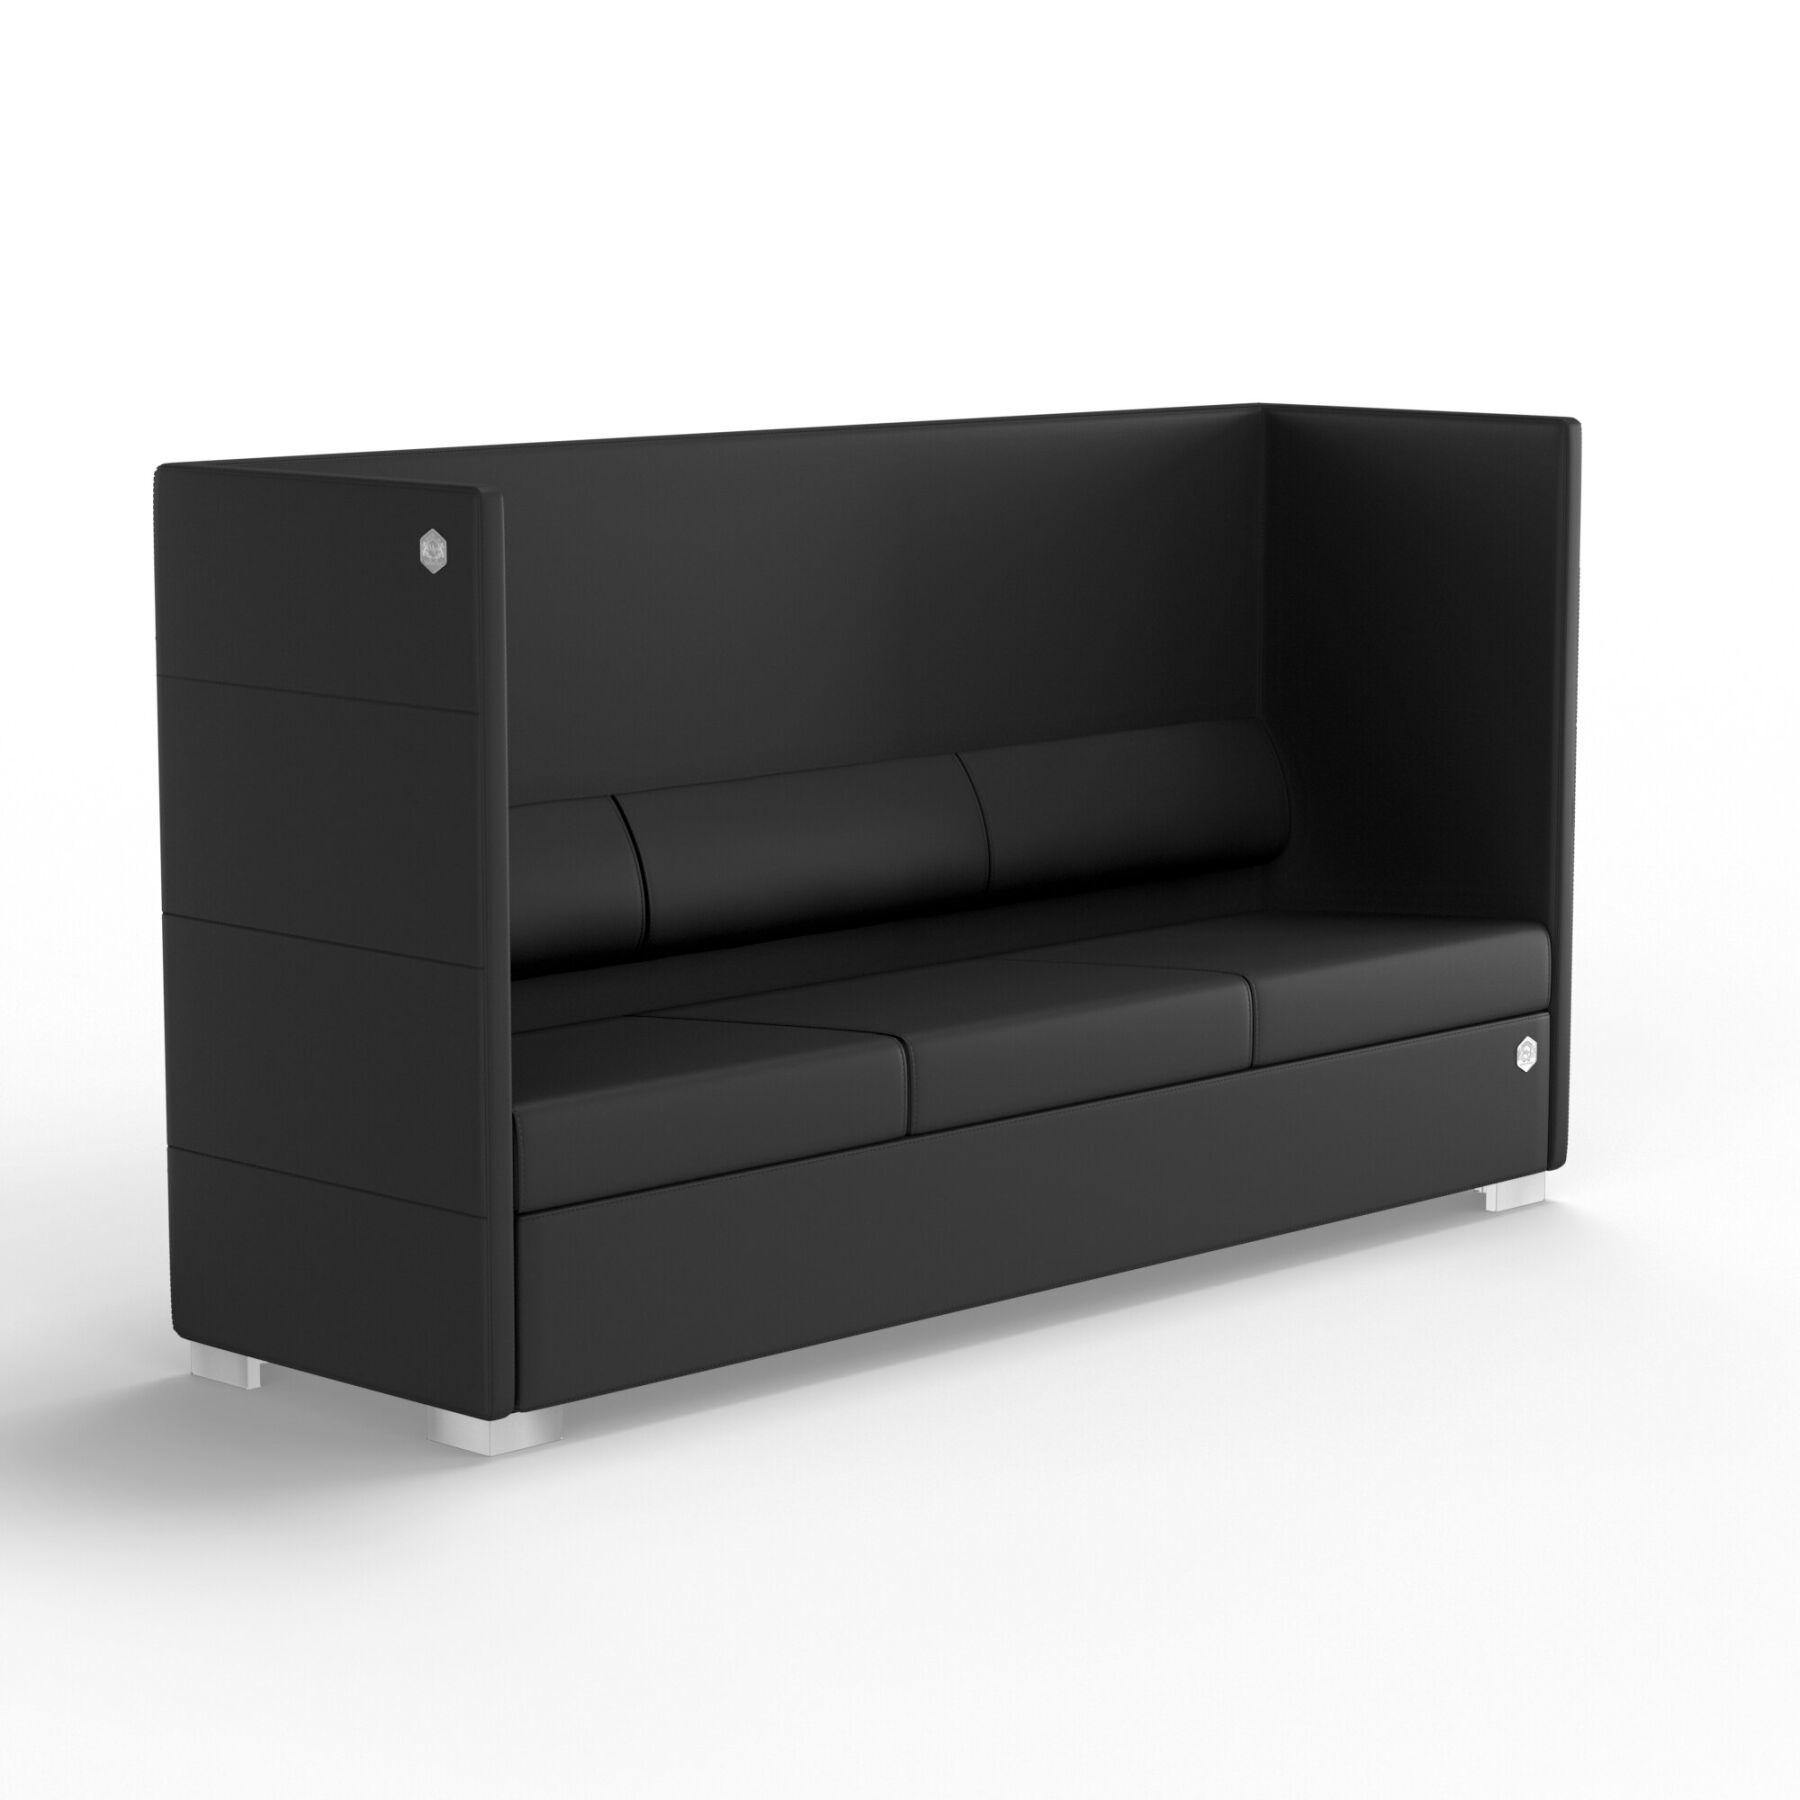 Трехместный диван KULIK SYSTEM PRIVATE Экокожа 3